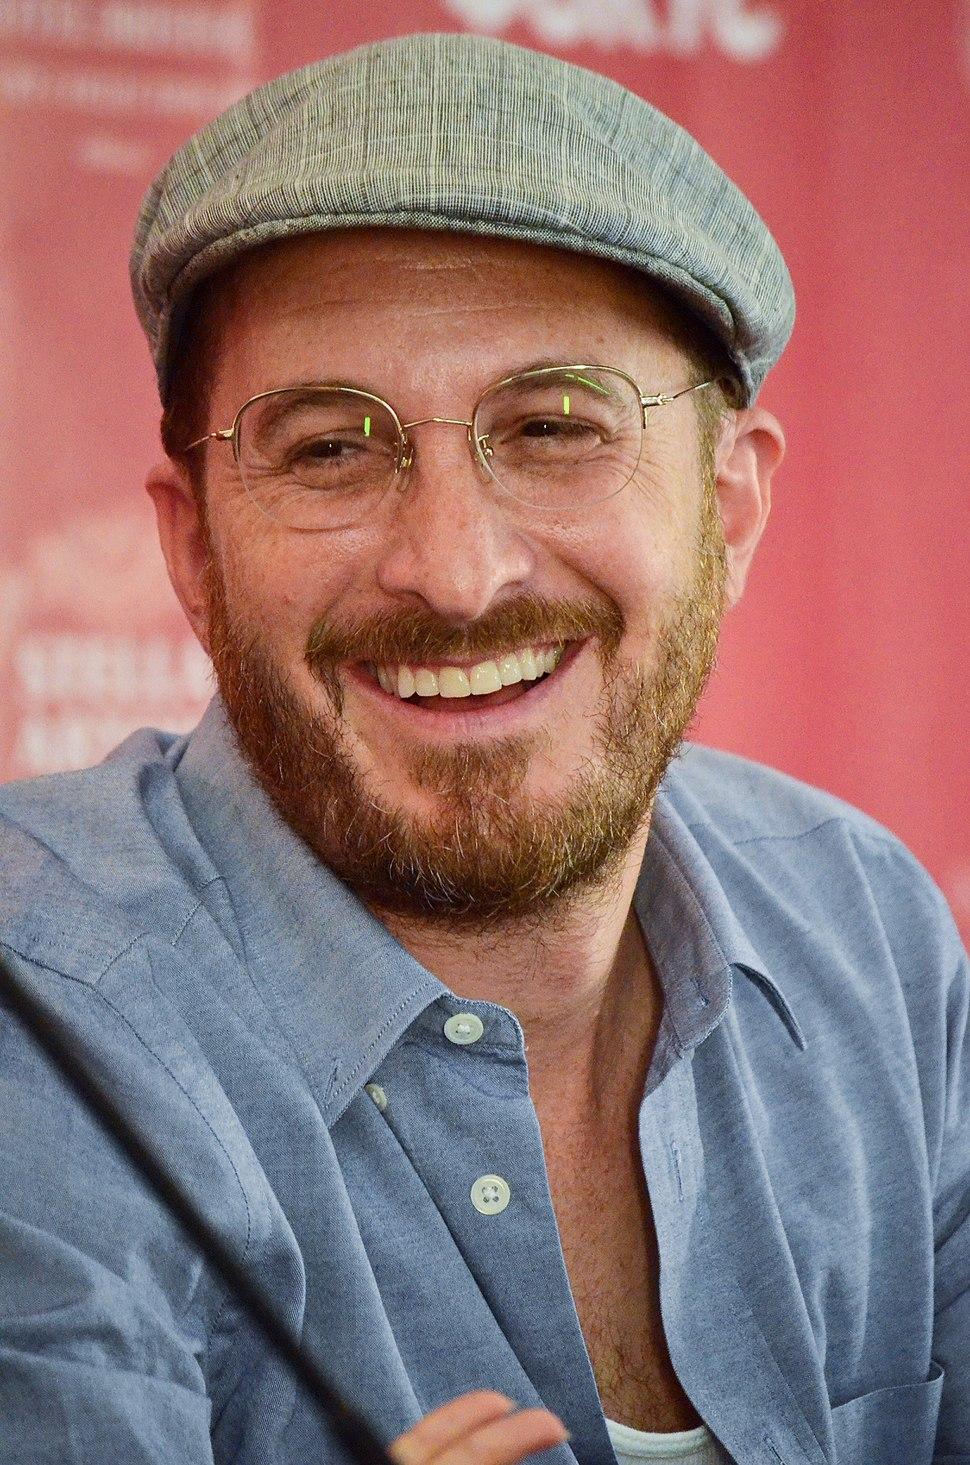 Laughing Darren Aronofsky at the Odessa International Film Festival